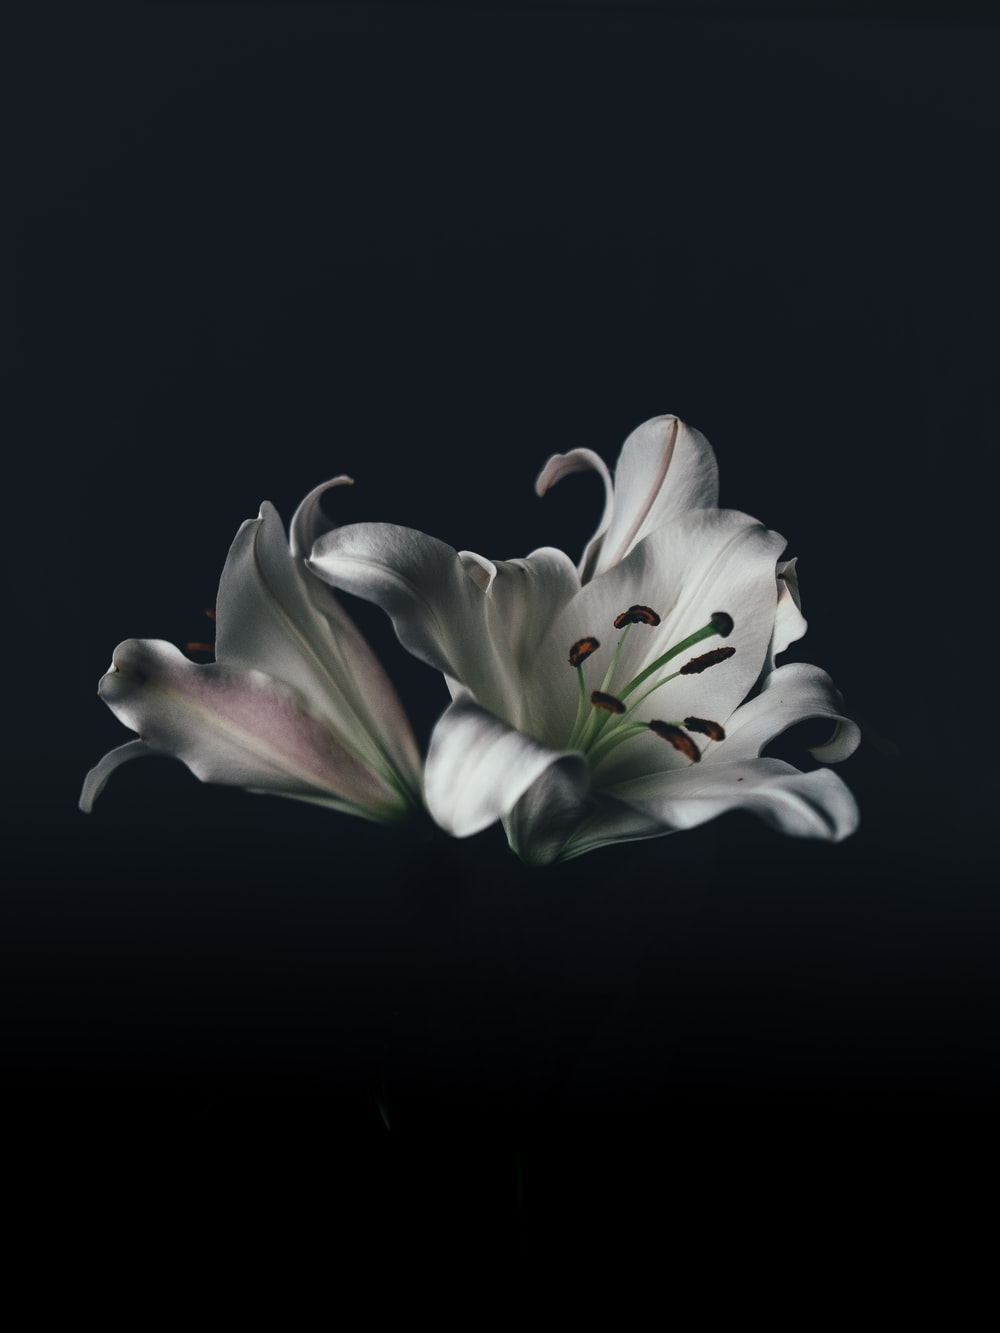 Rose In Full Bloom Photo By Rodion Kutsaev Frostroomhead On Unsplash